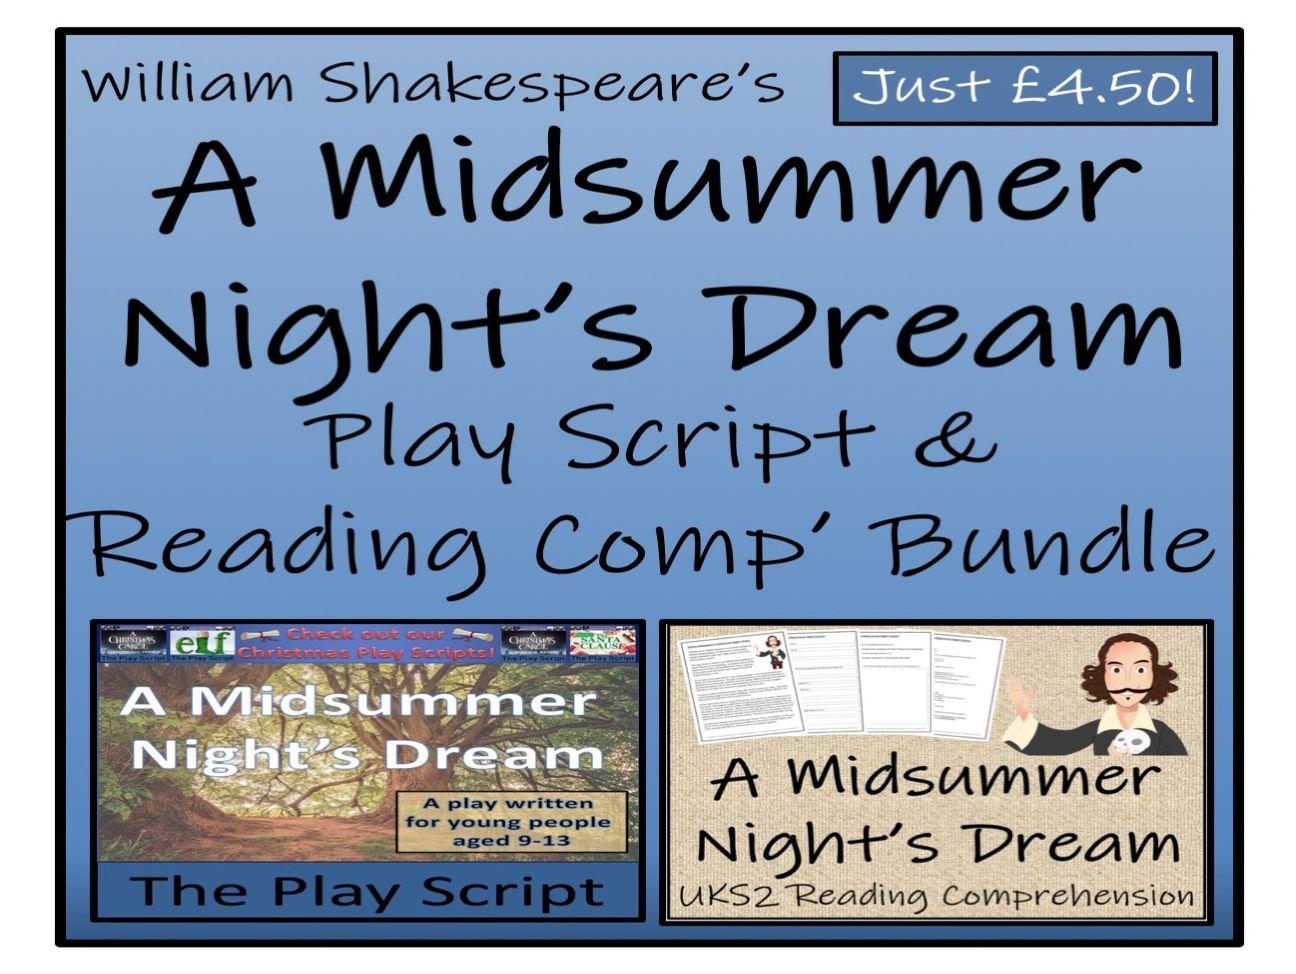 UKS2 Literacy - William Shakespeare's A Midsummer Night's Dream - Play Script & Reading Comprehension Bundle